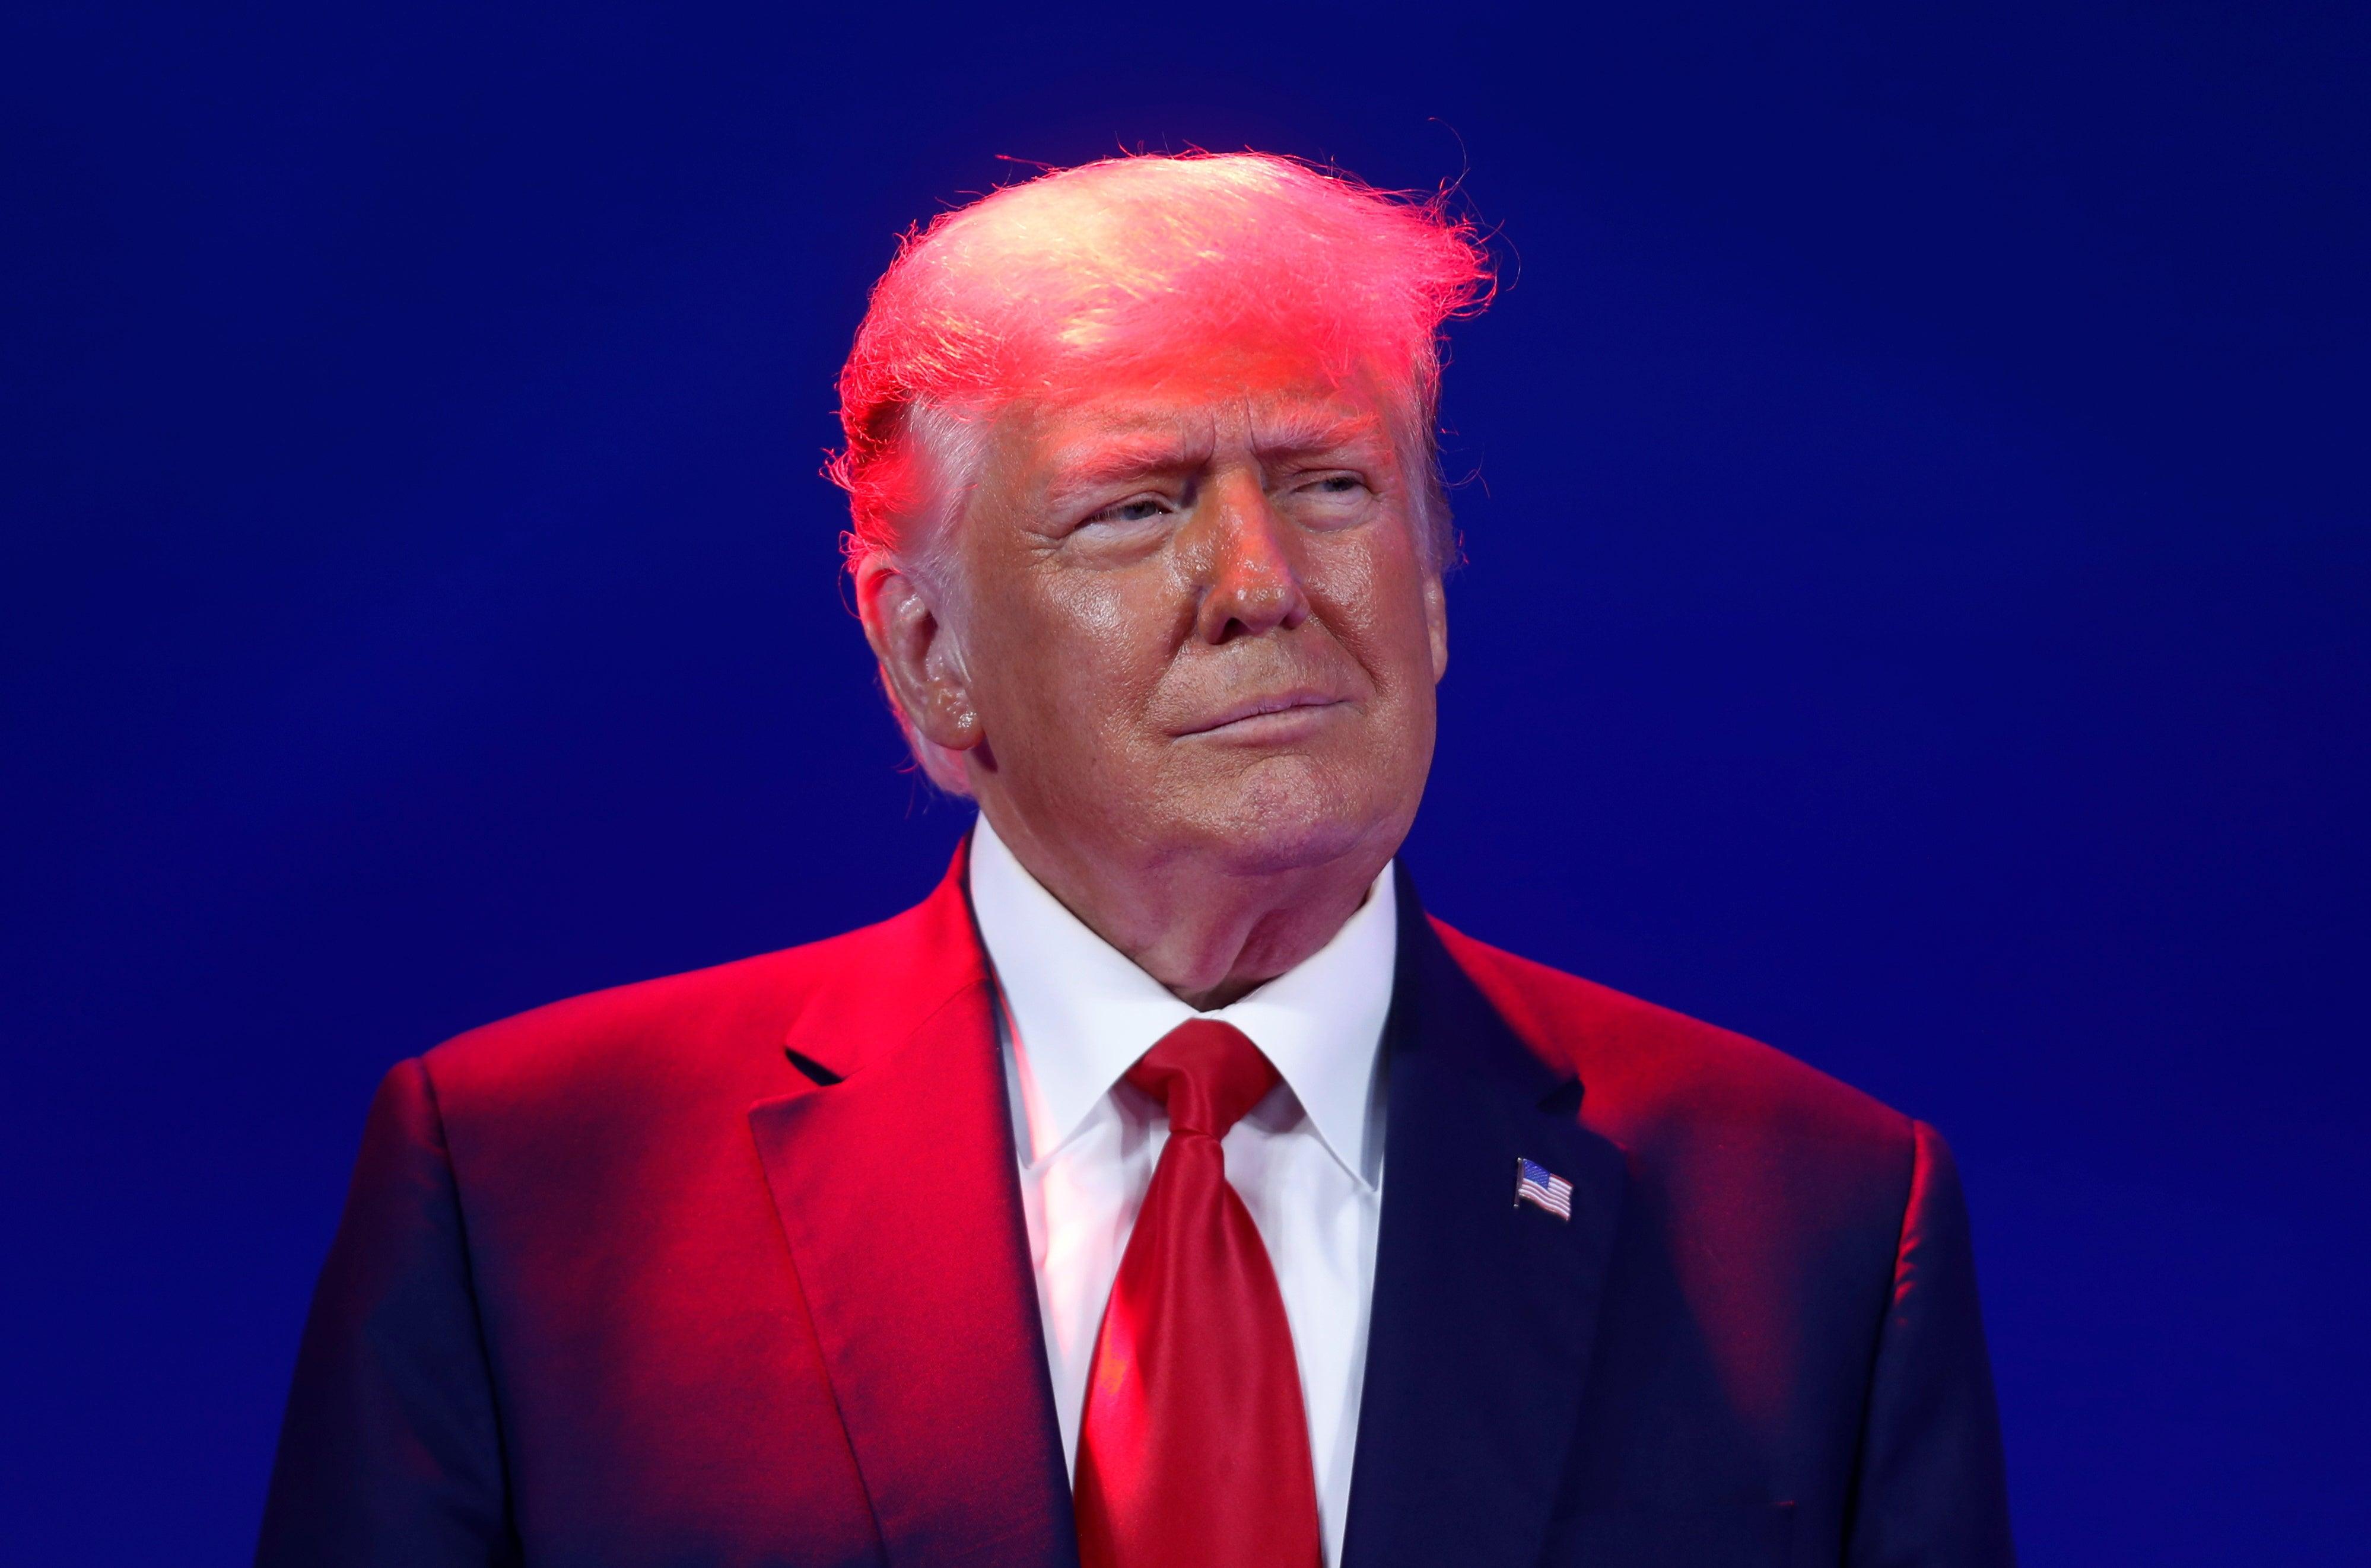 Latest Donald Trump news - cover